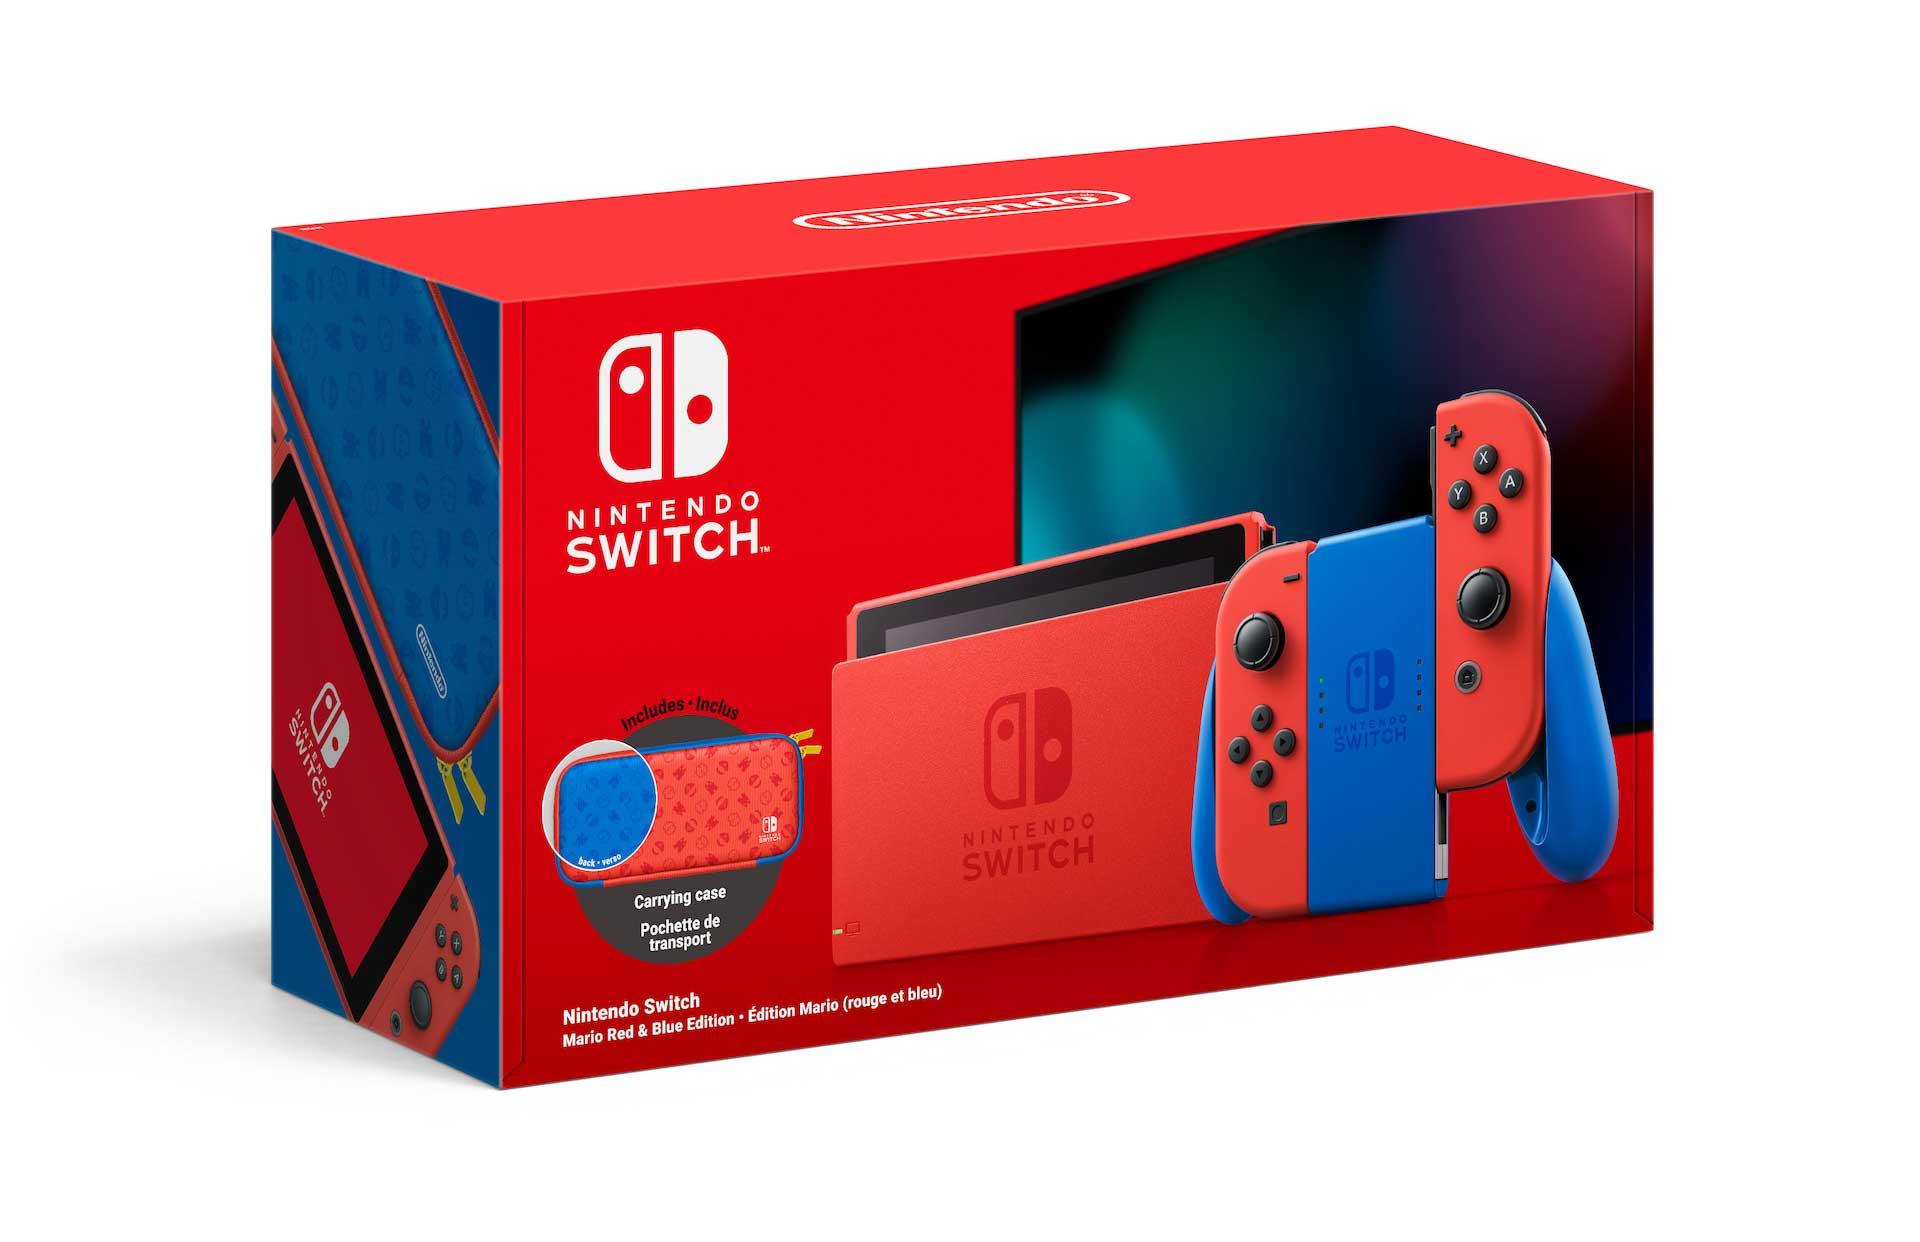 nintendo switch design 2020 red blue